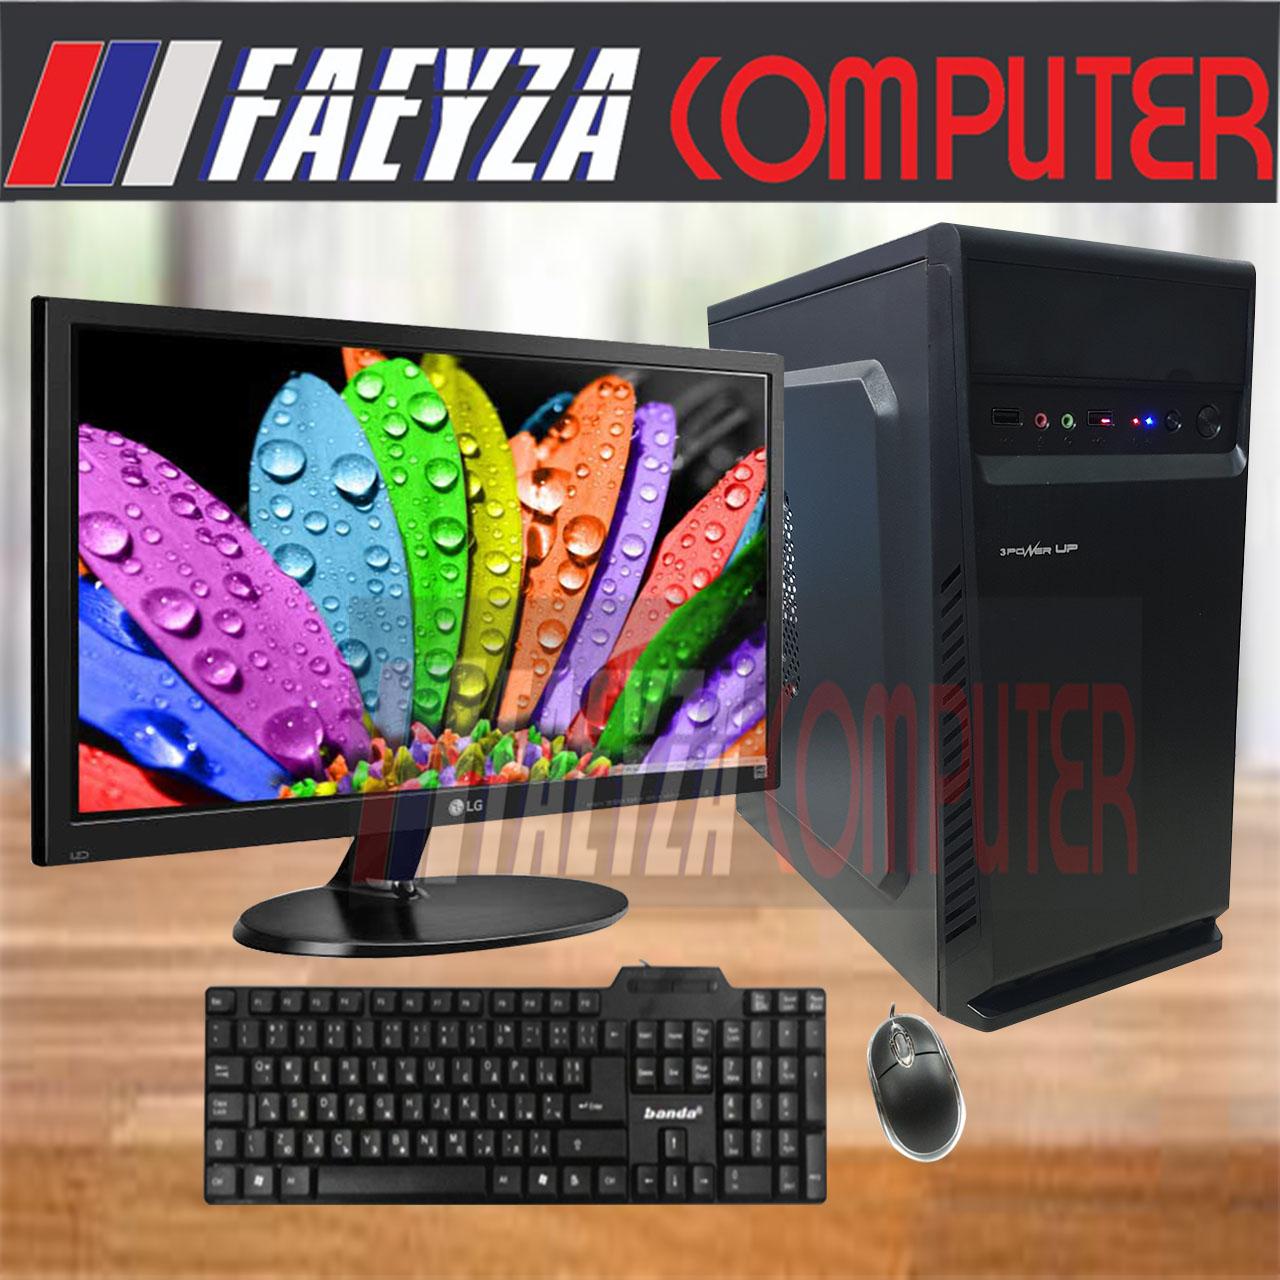 https://www.lazada.co.id/products/pc-lengkap-intel-core-i5-650-ram-8gb-hdd-500gb-led-lg-19-i948064065-s1428978891.html